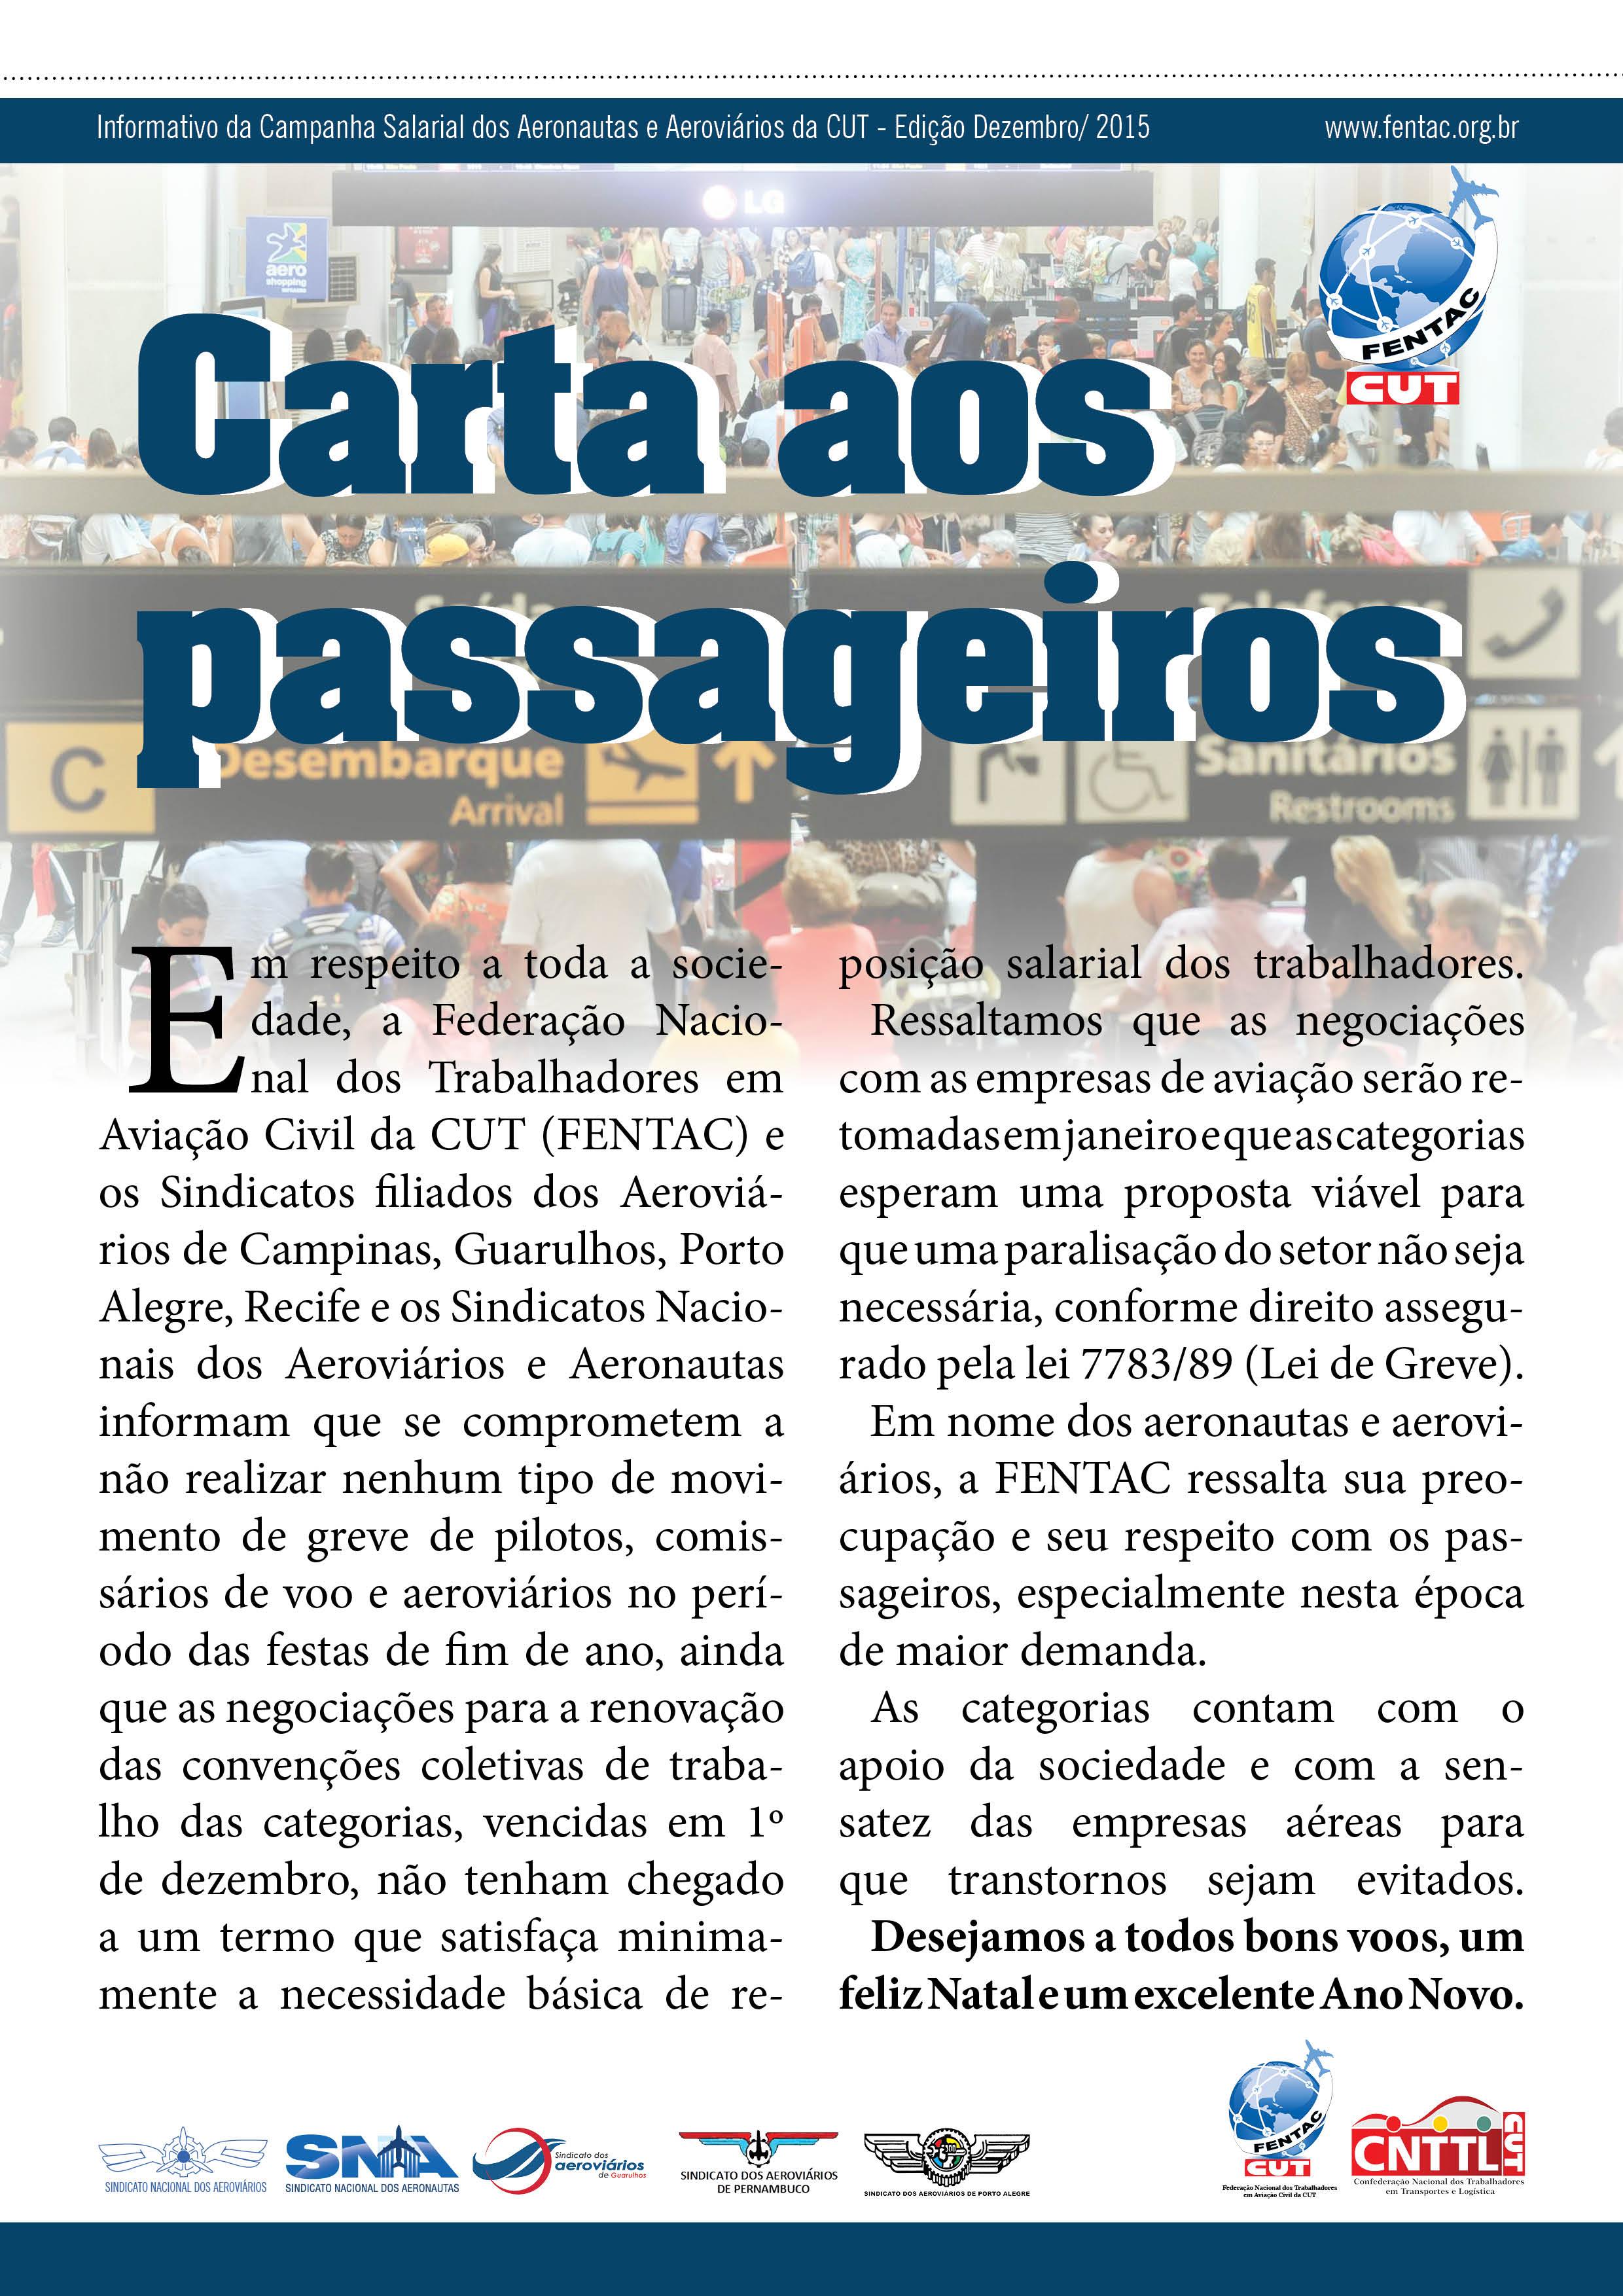 Carta Aberta aos Passageiros